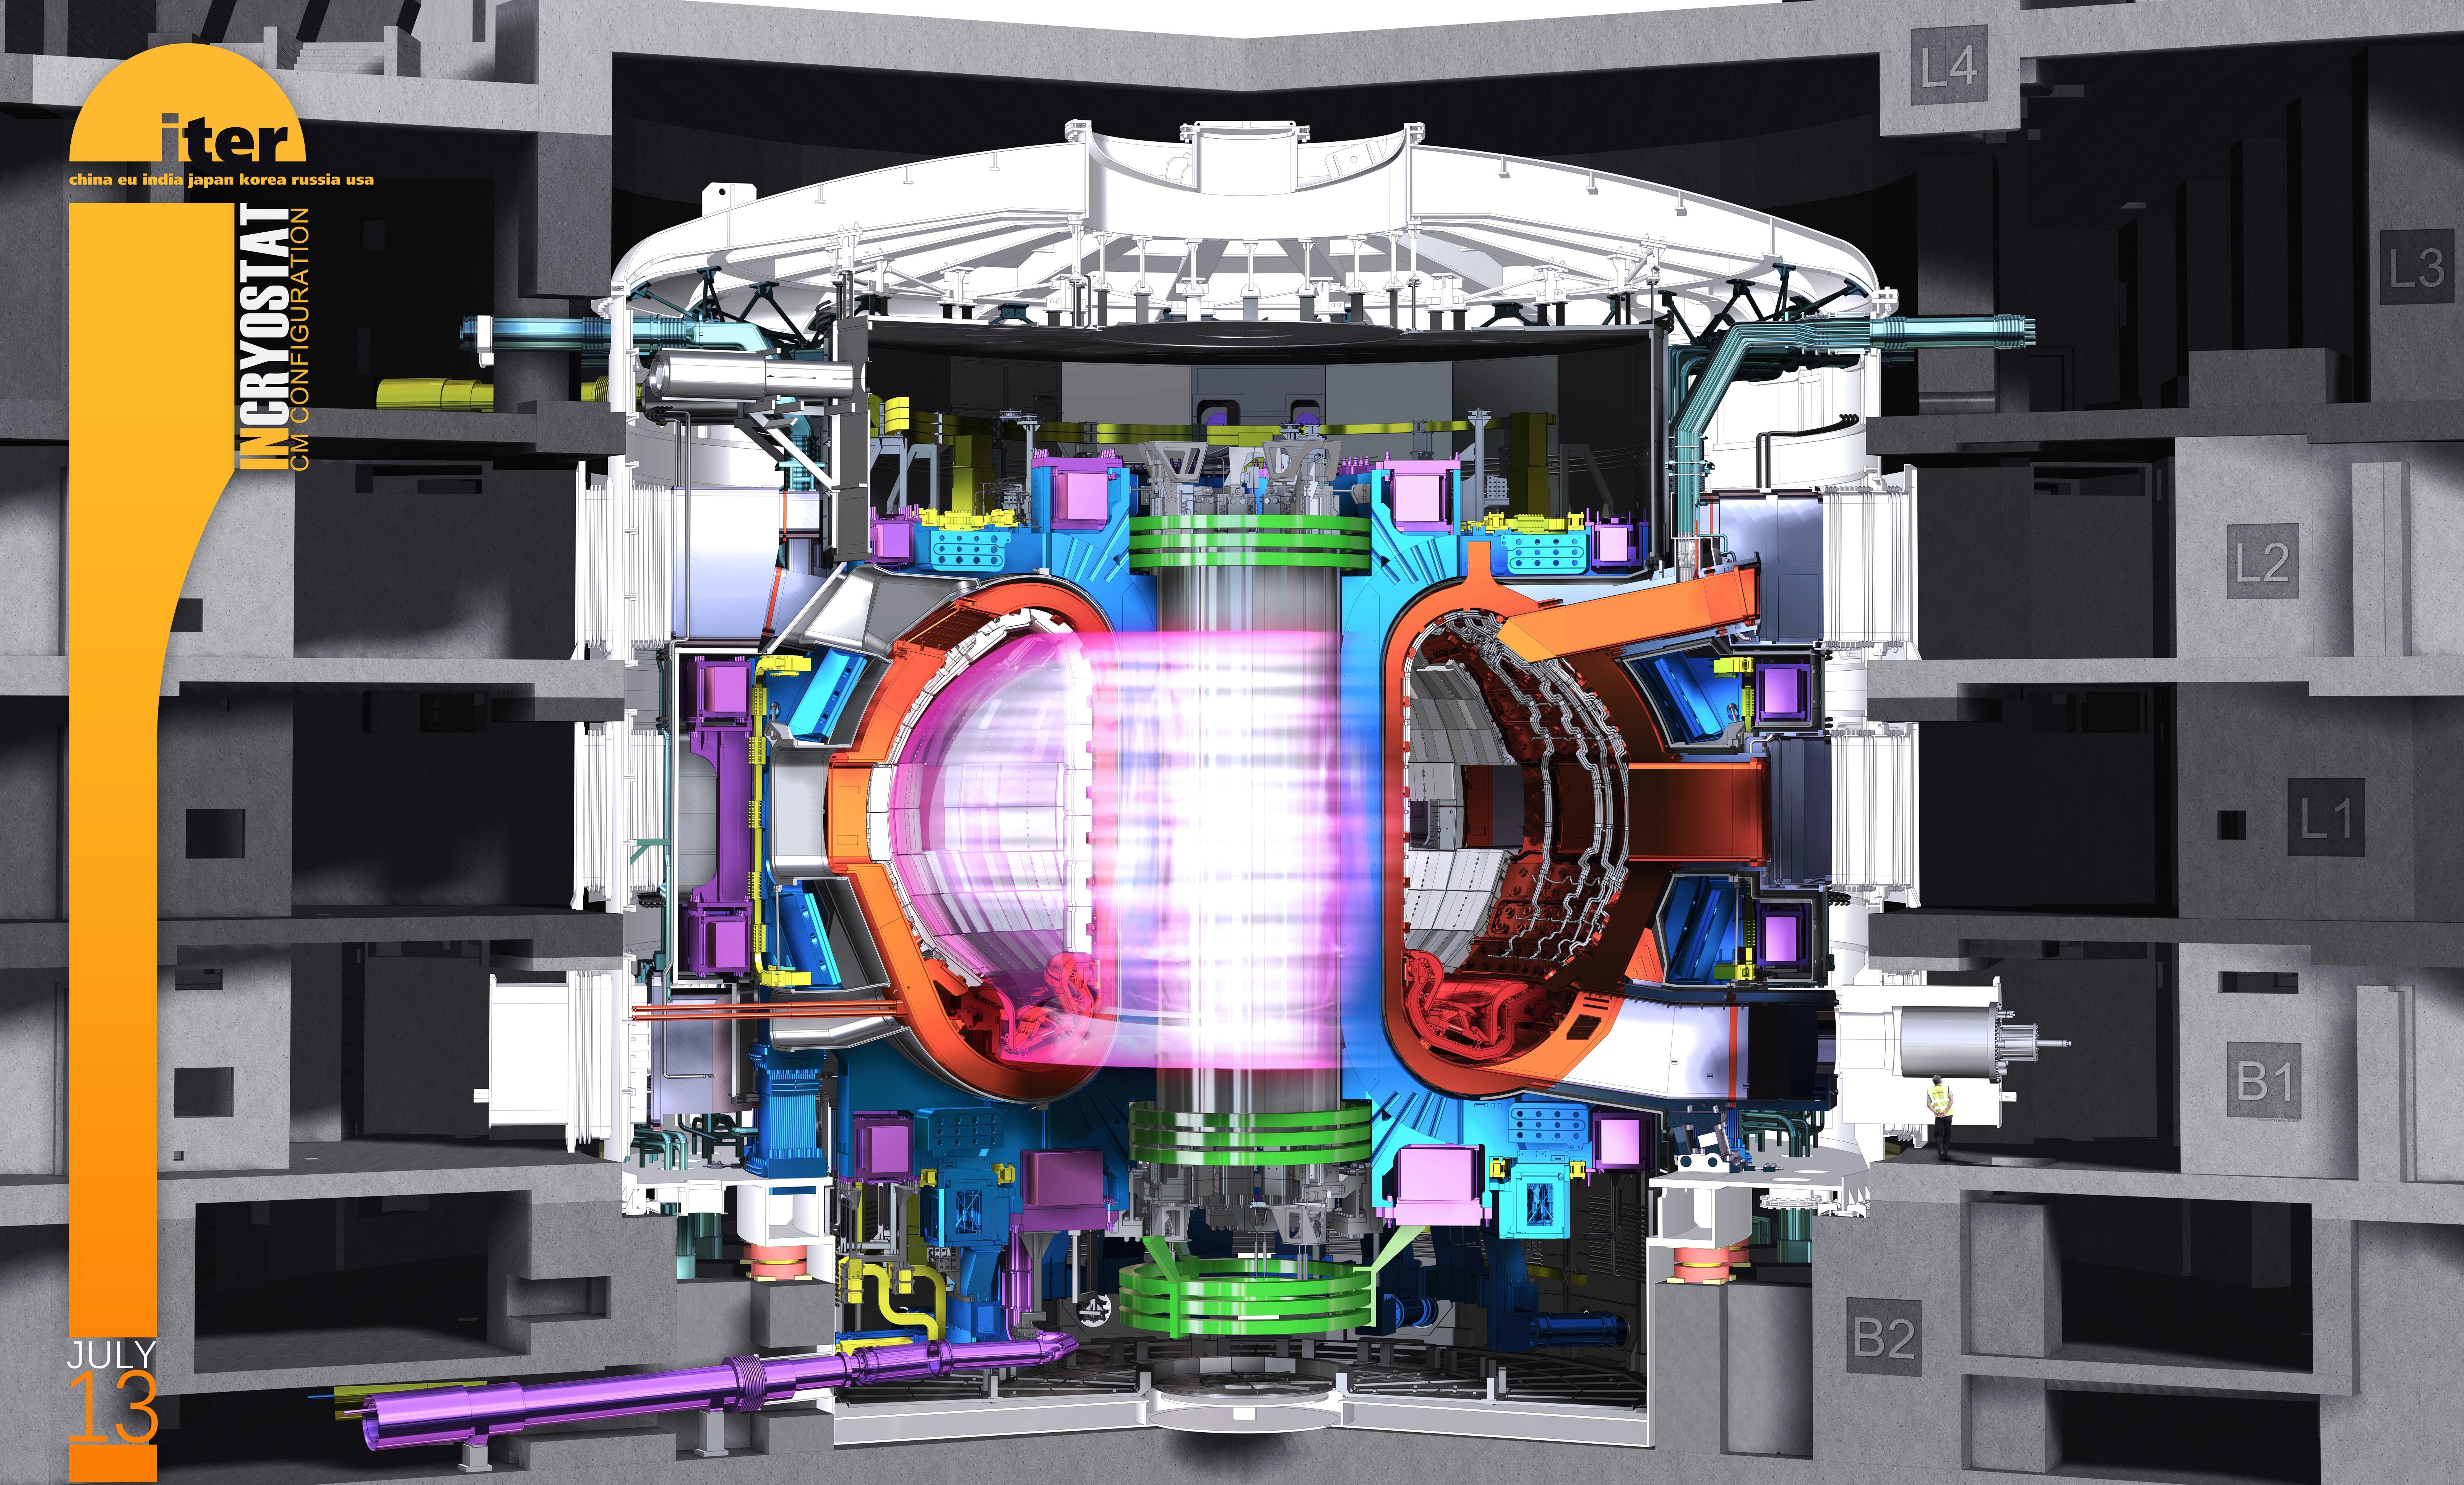 ITER 핵융합 반응장치 내부 단면도 | 사진: ITER